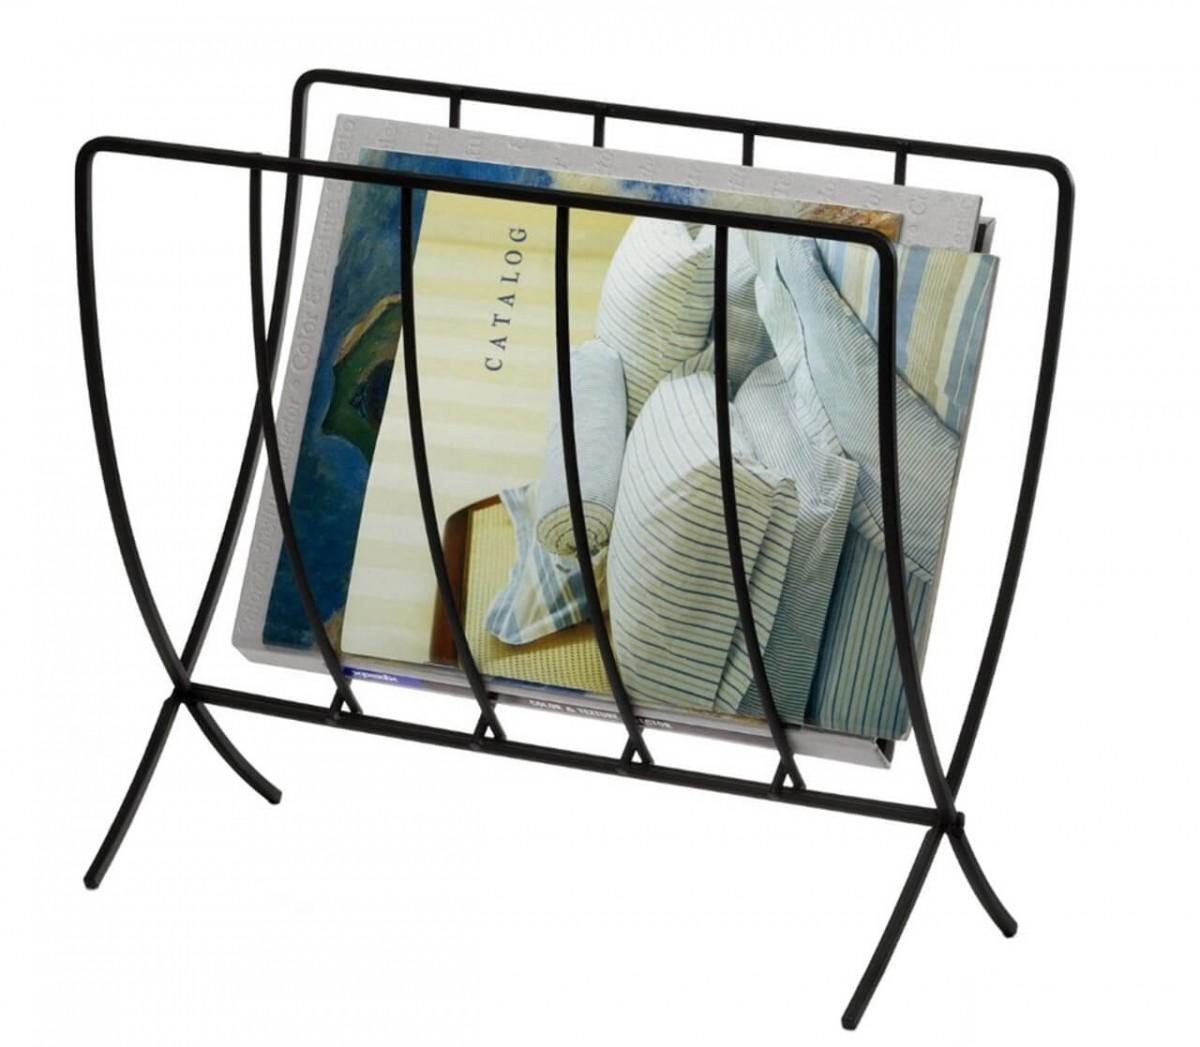 organiser-magazines-salle-bain-7